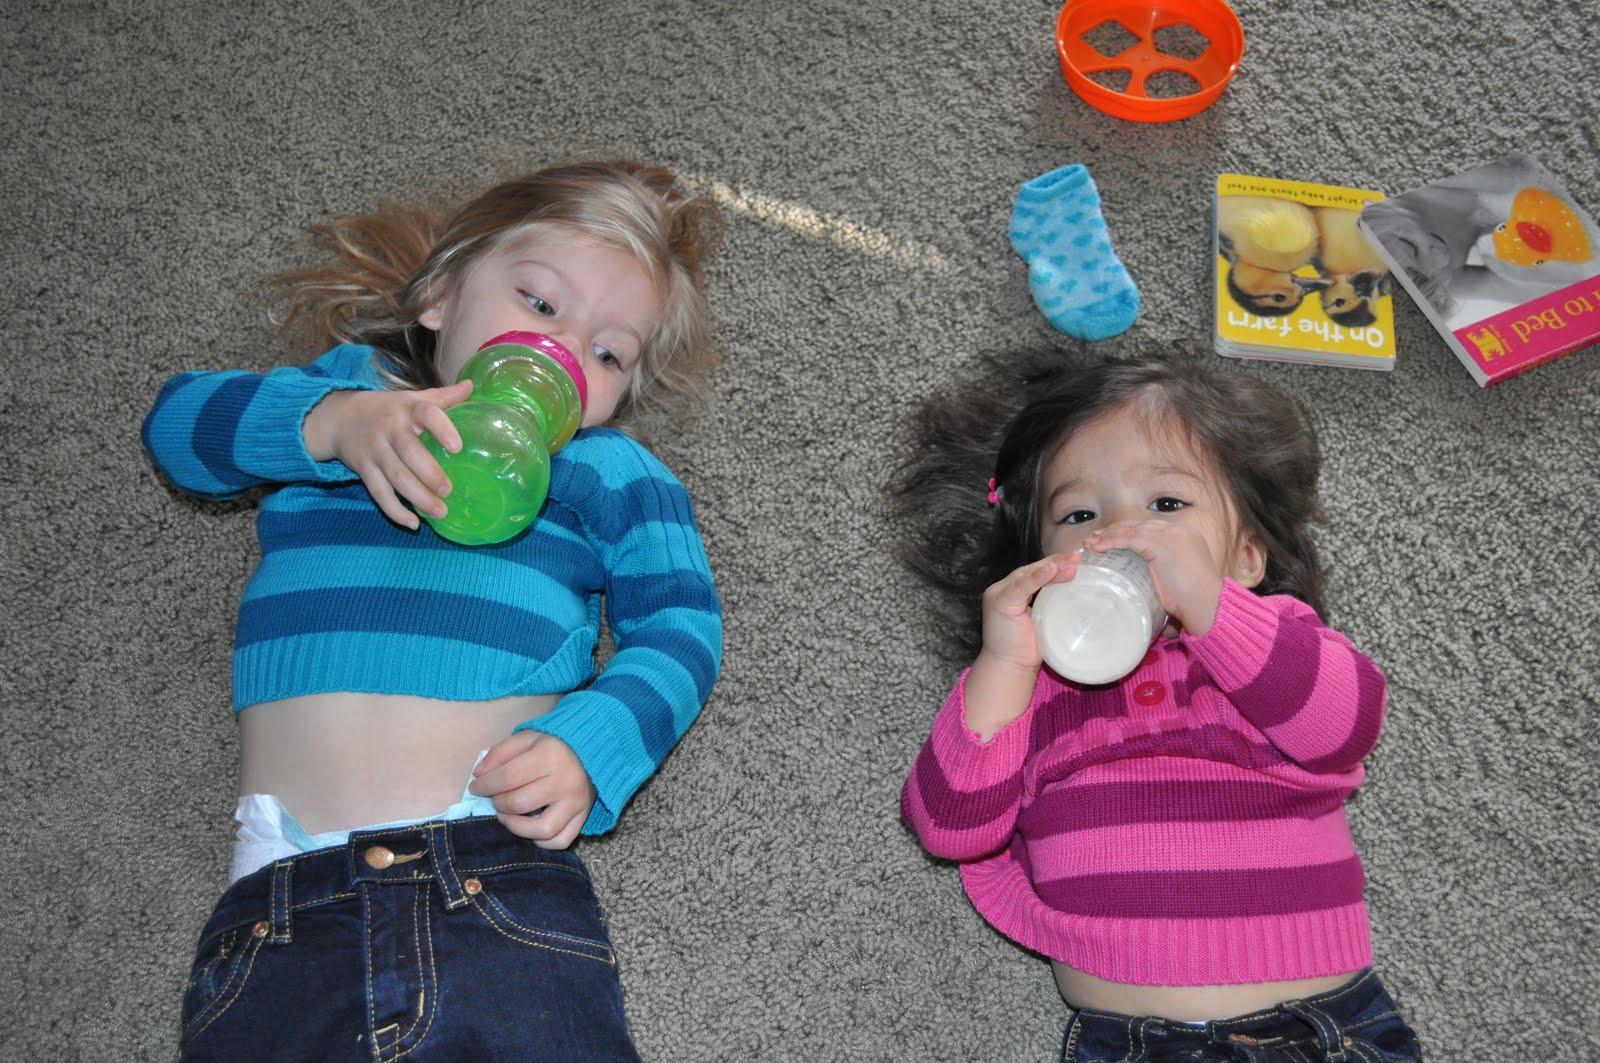 imgsrc candid kids Sunday, November 21, 2010